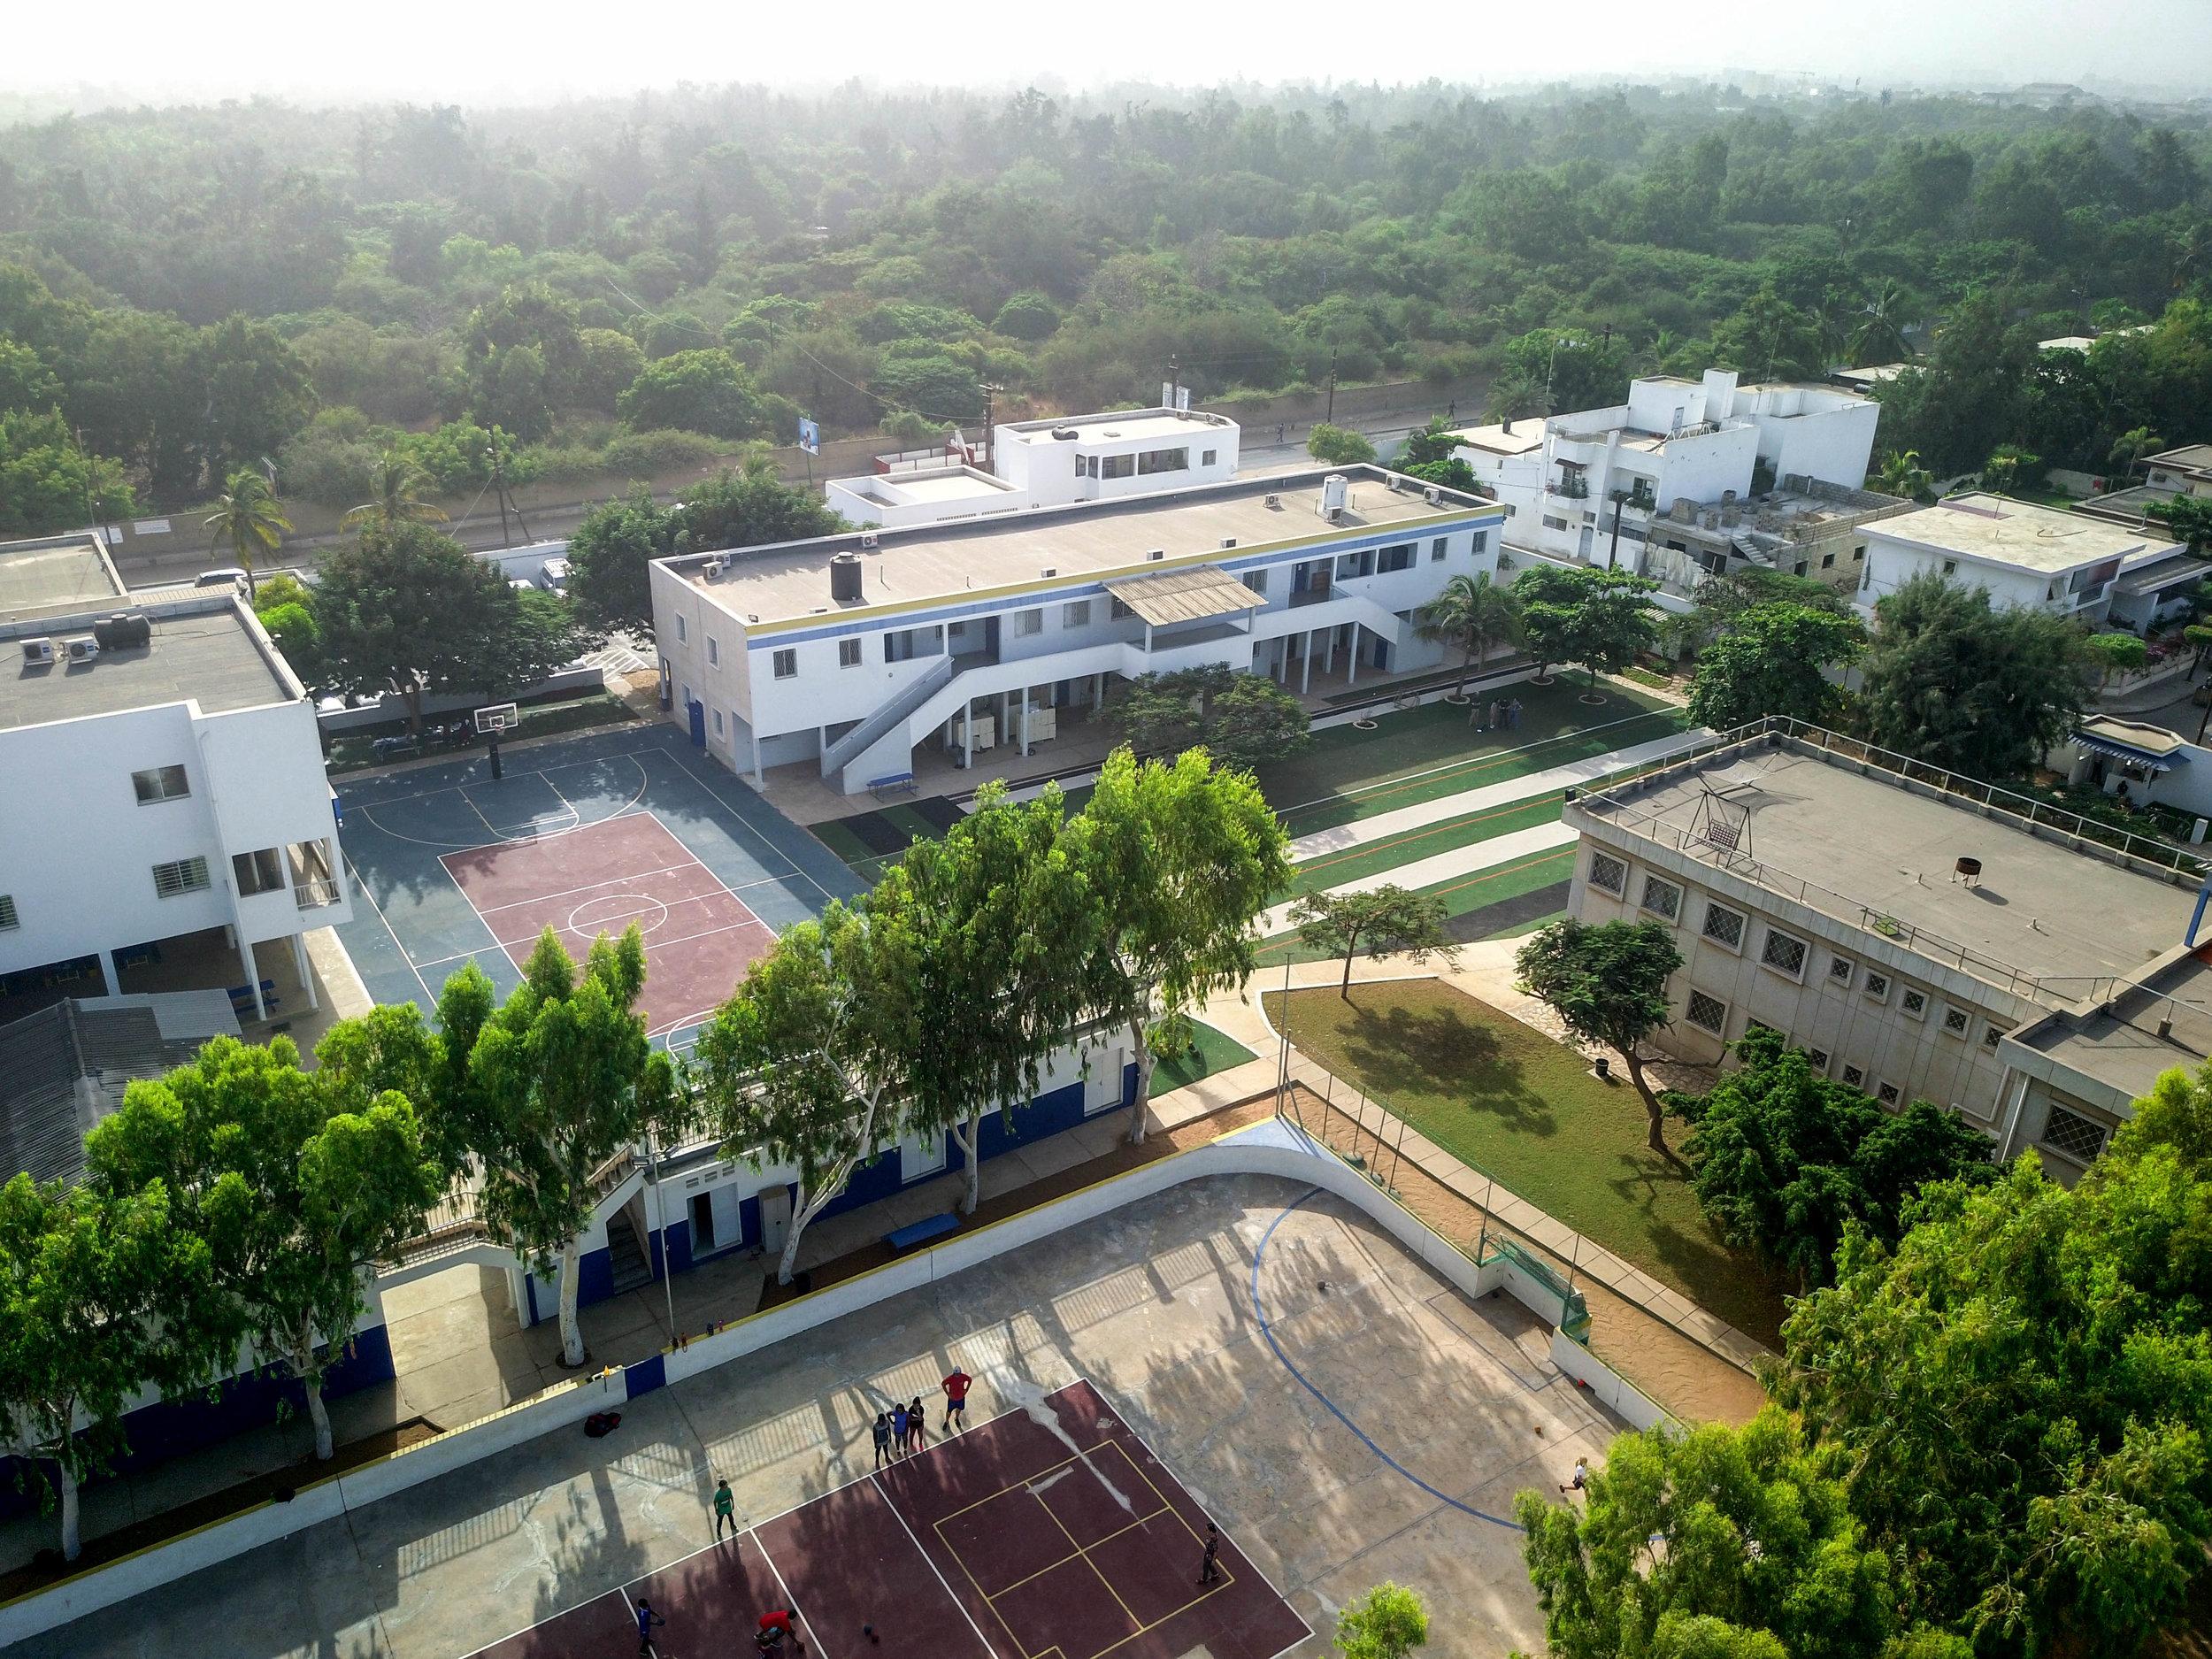 Dakar Academy campus and student community.